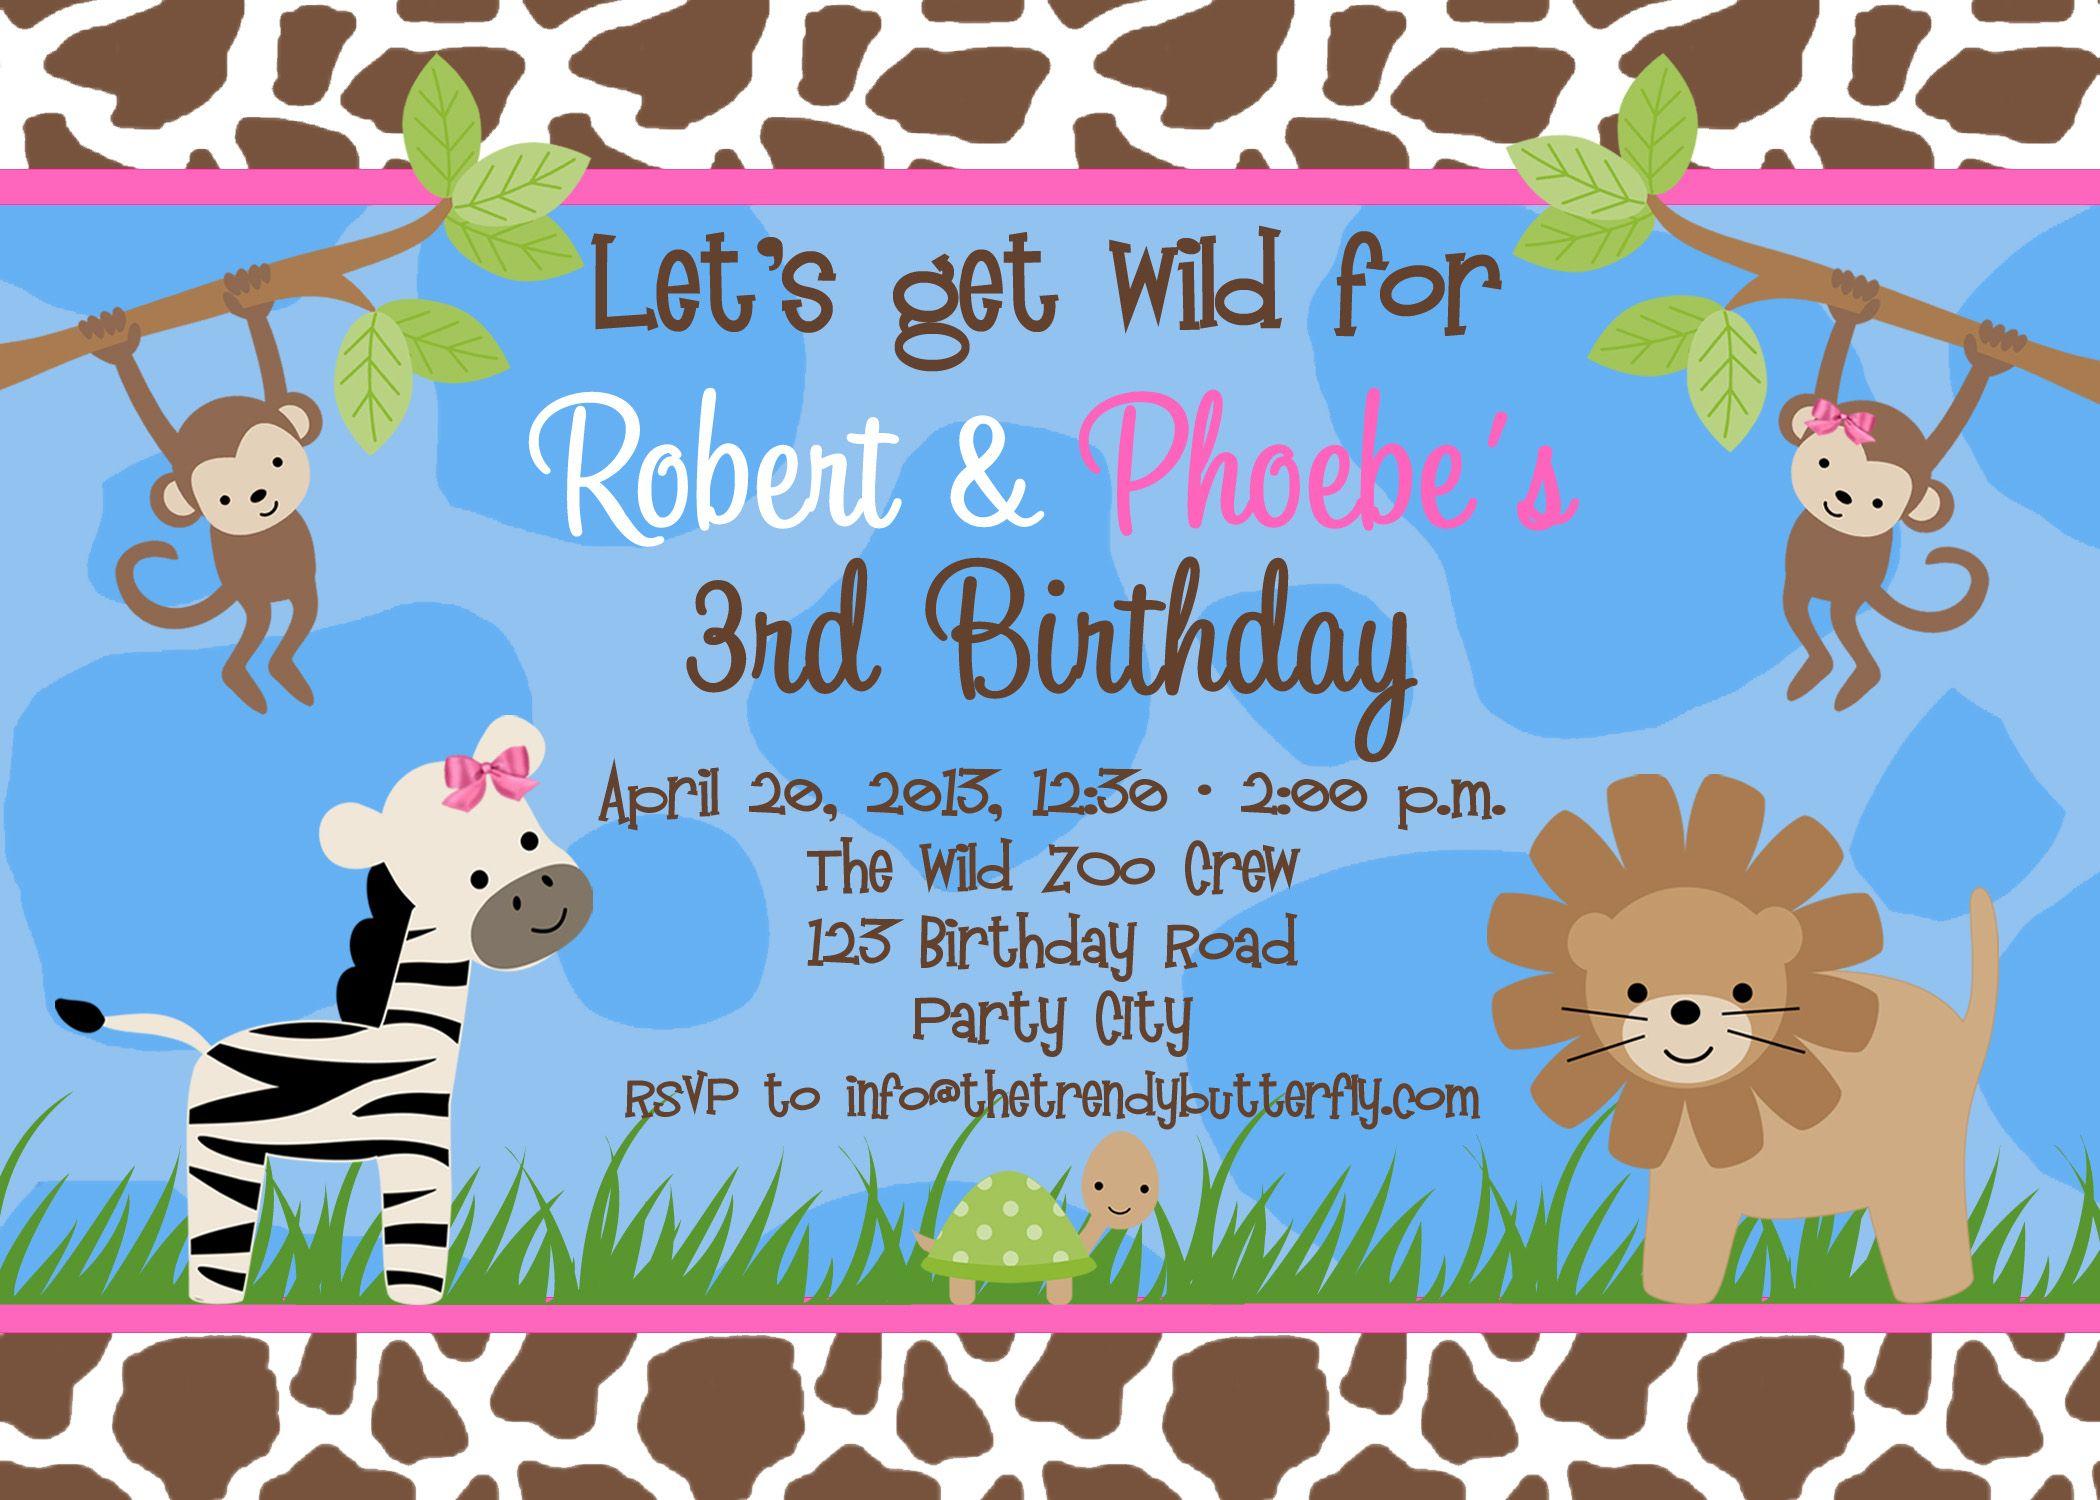 Free Birthday Party Invitation | Craft For Amber | Pinterest - Jungle Theme Birthday Invitations Free Printable